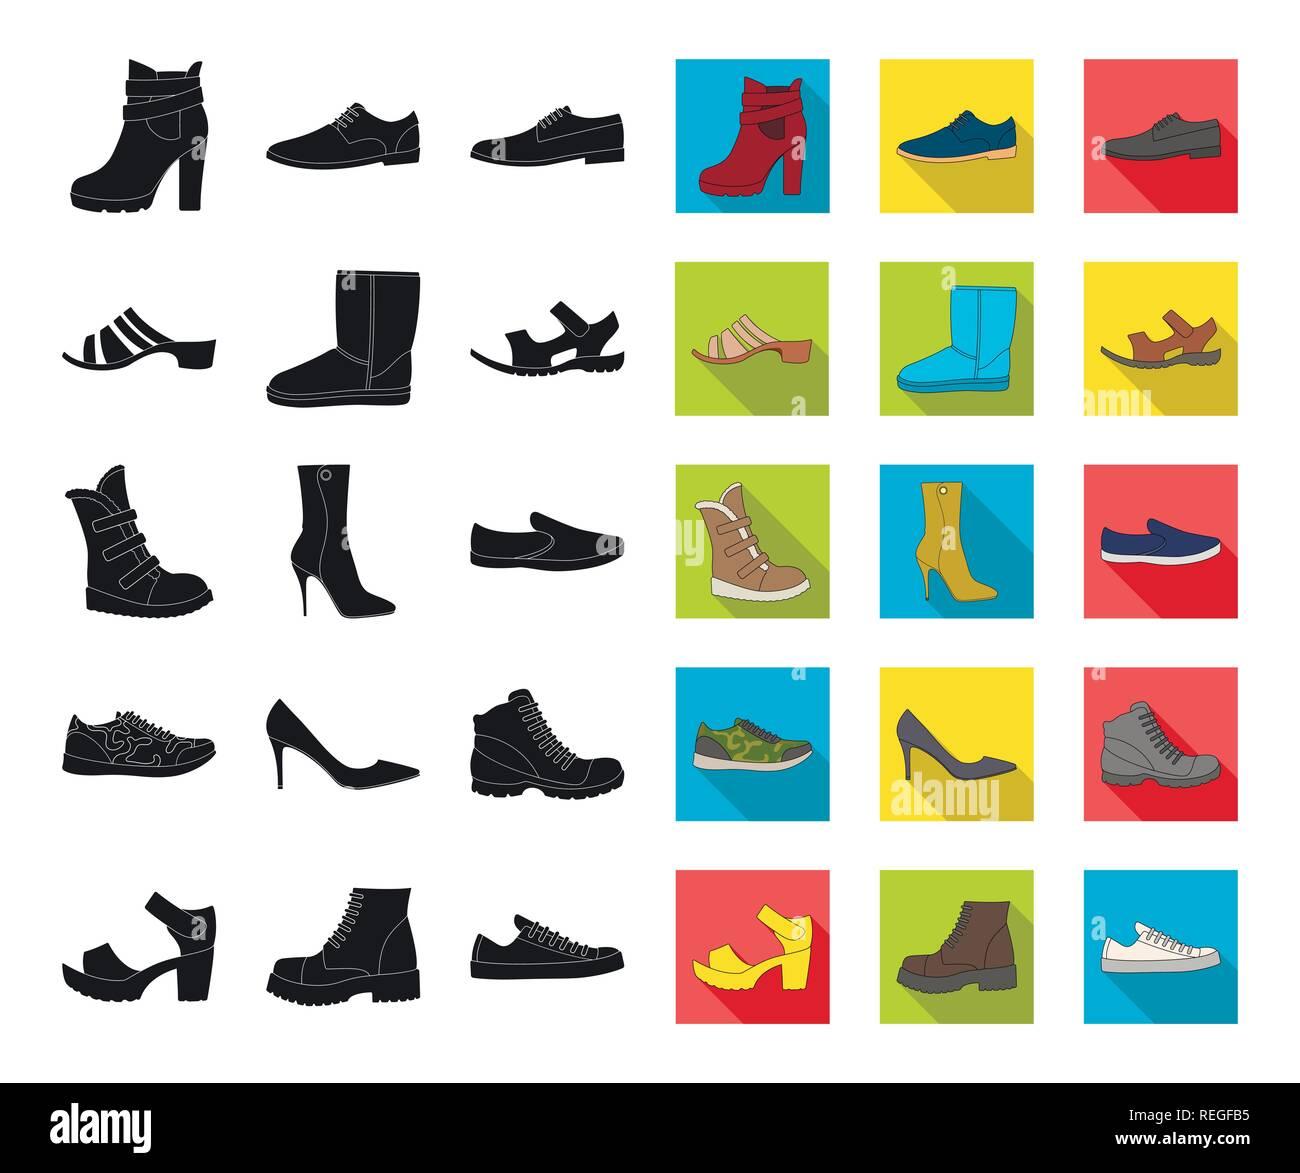 Boot Camp: Guide to Men's Boot Styles | Scarpe eleganti